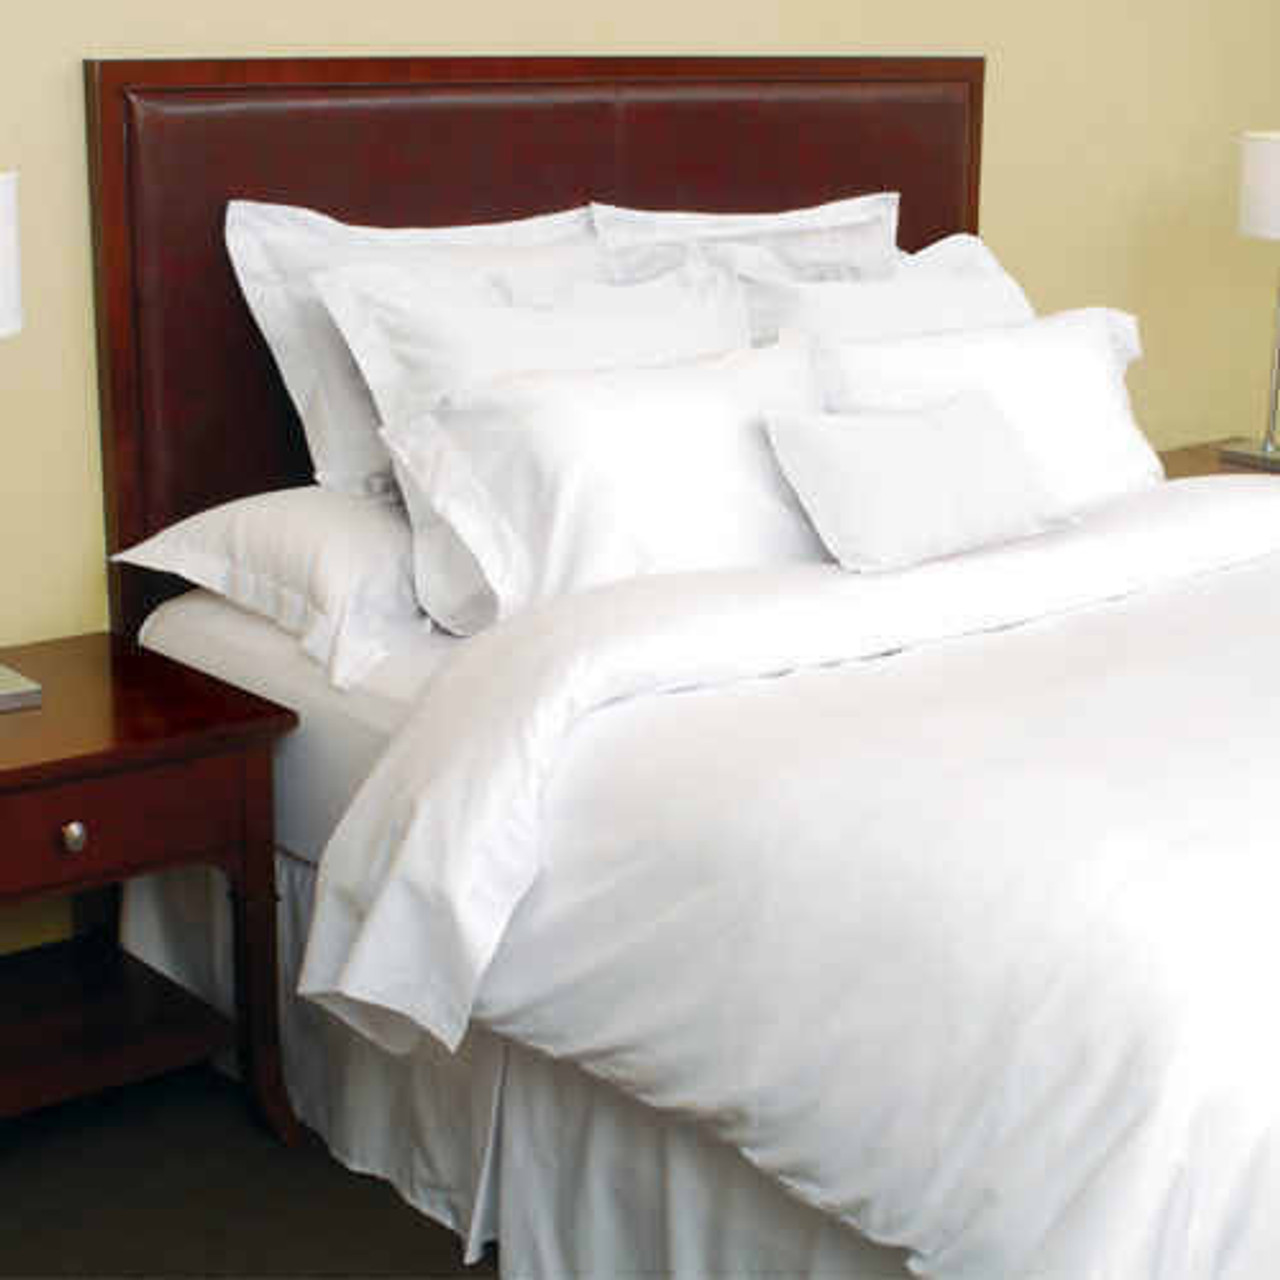 Dependability by 1888 Mills Dependability by 1888 Mills Fitted Bed Sheets